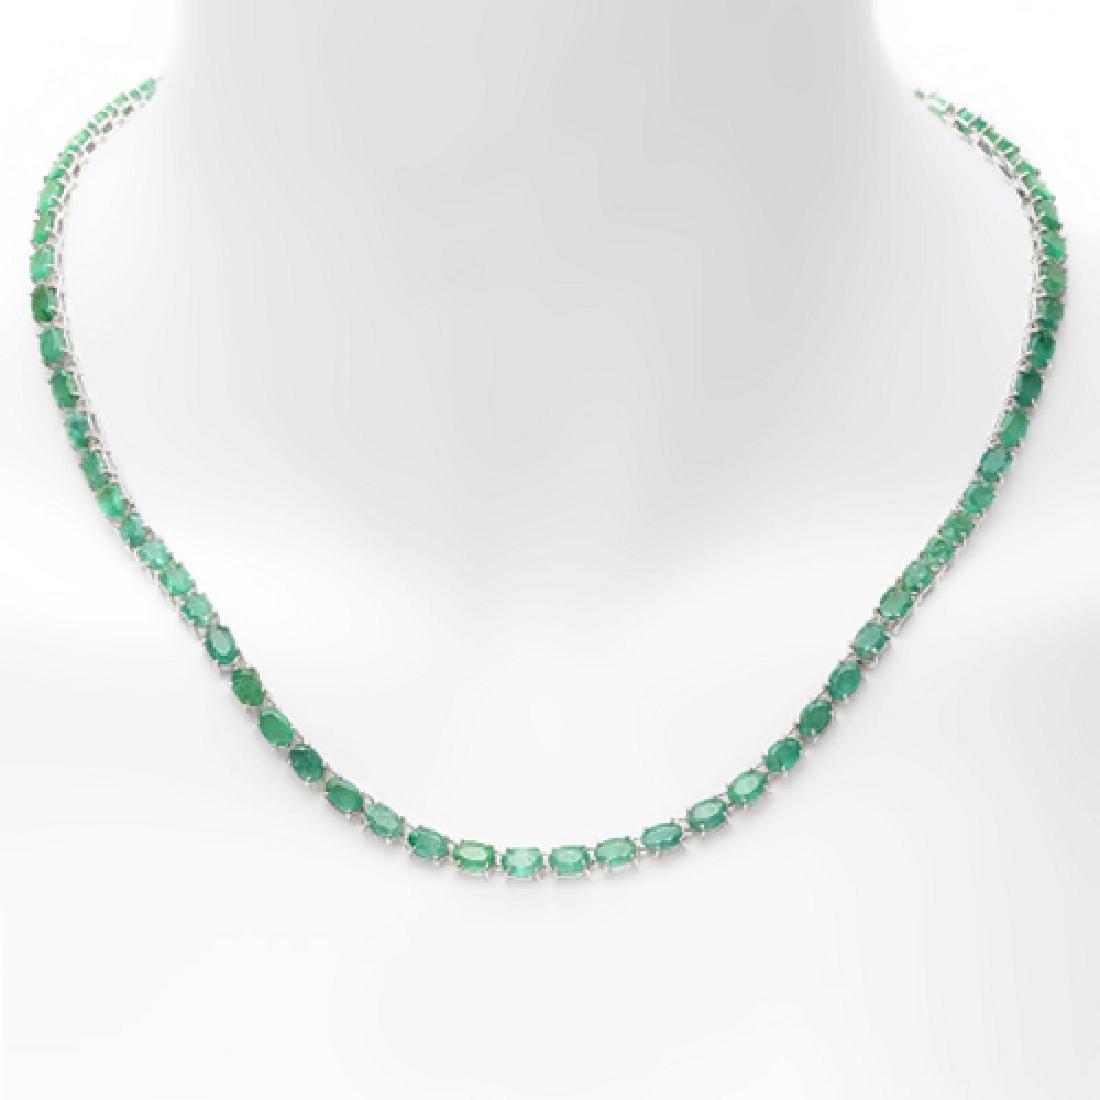 30.70 Carat Natural Emerald 18K Solid White Gold